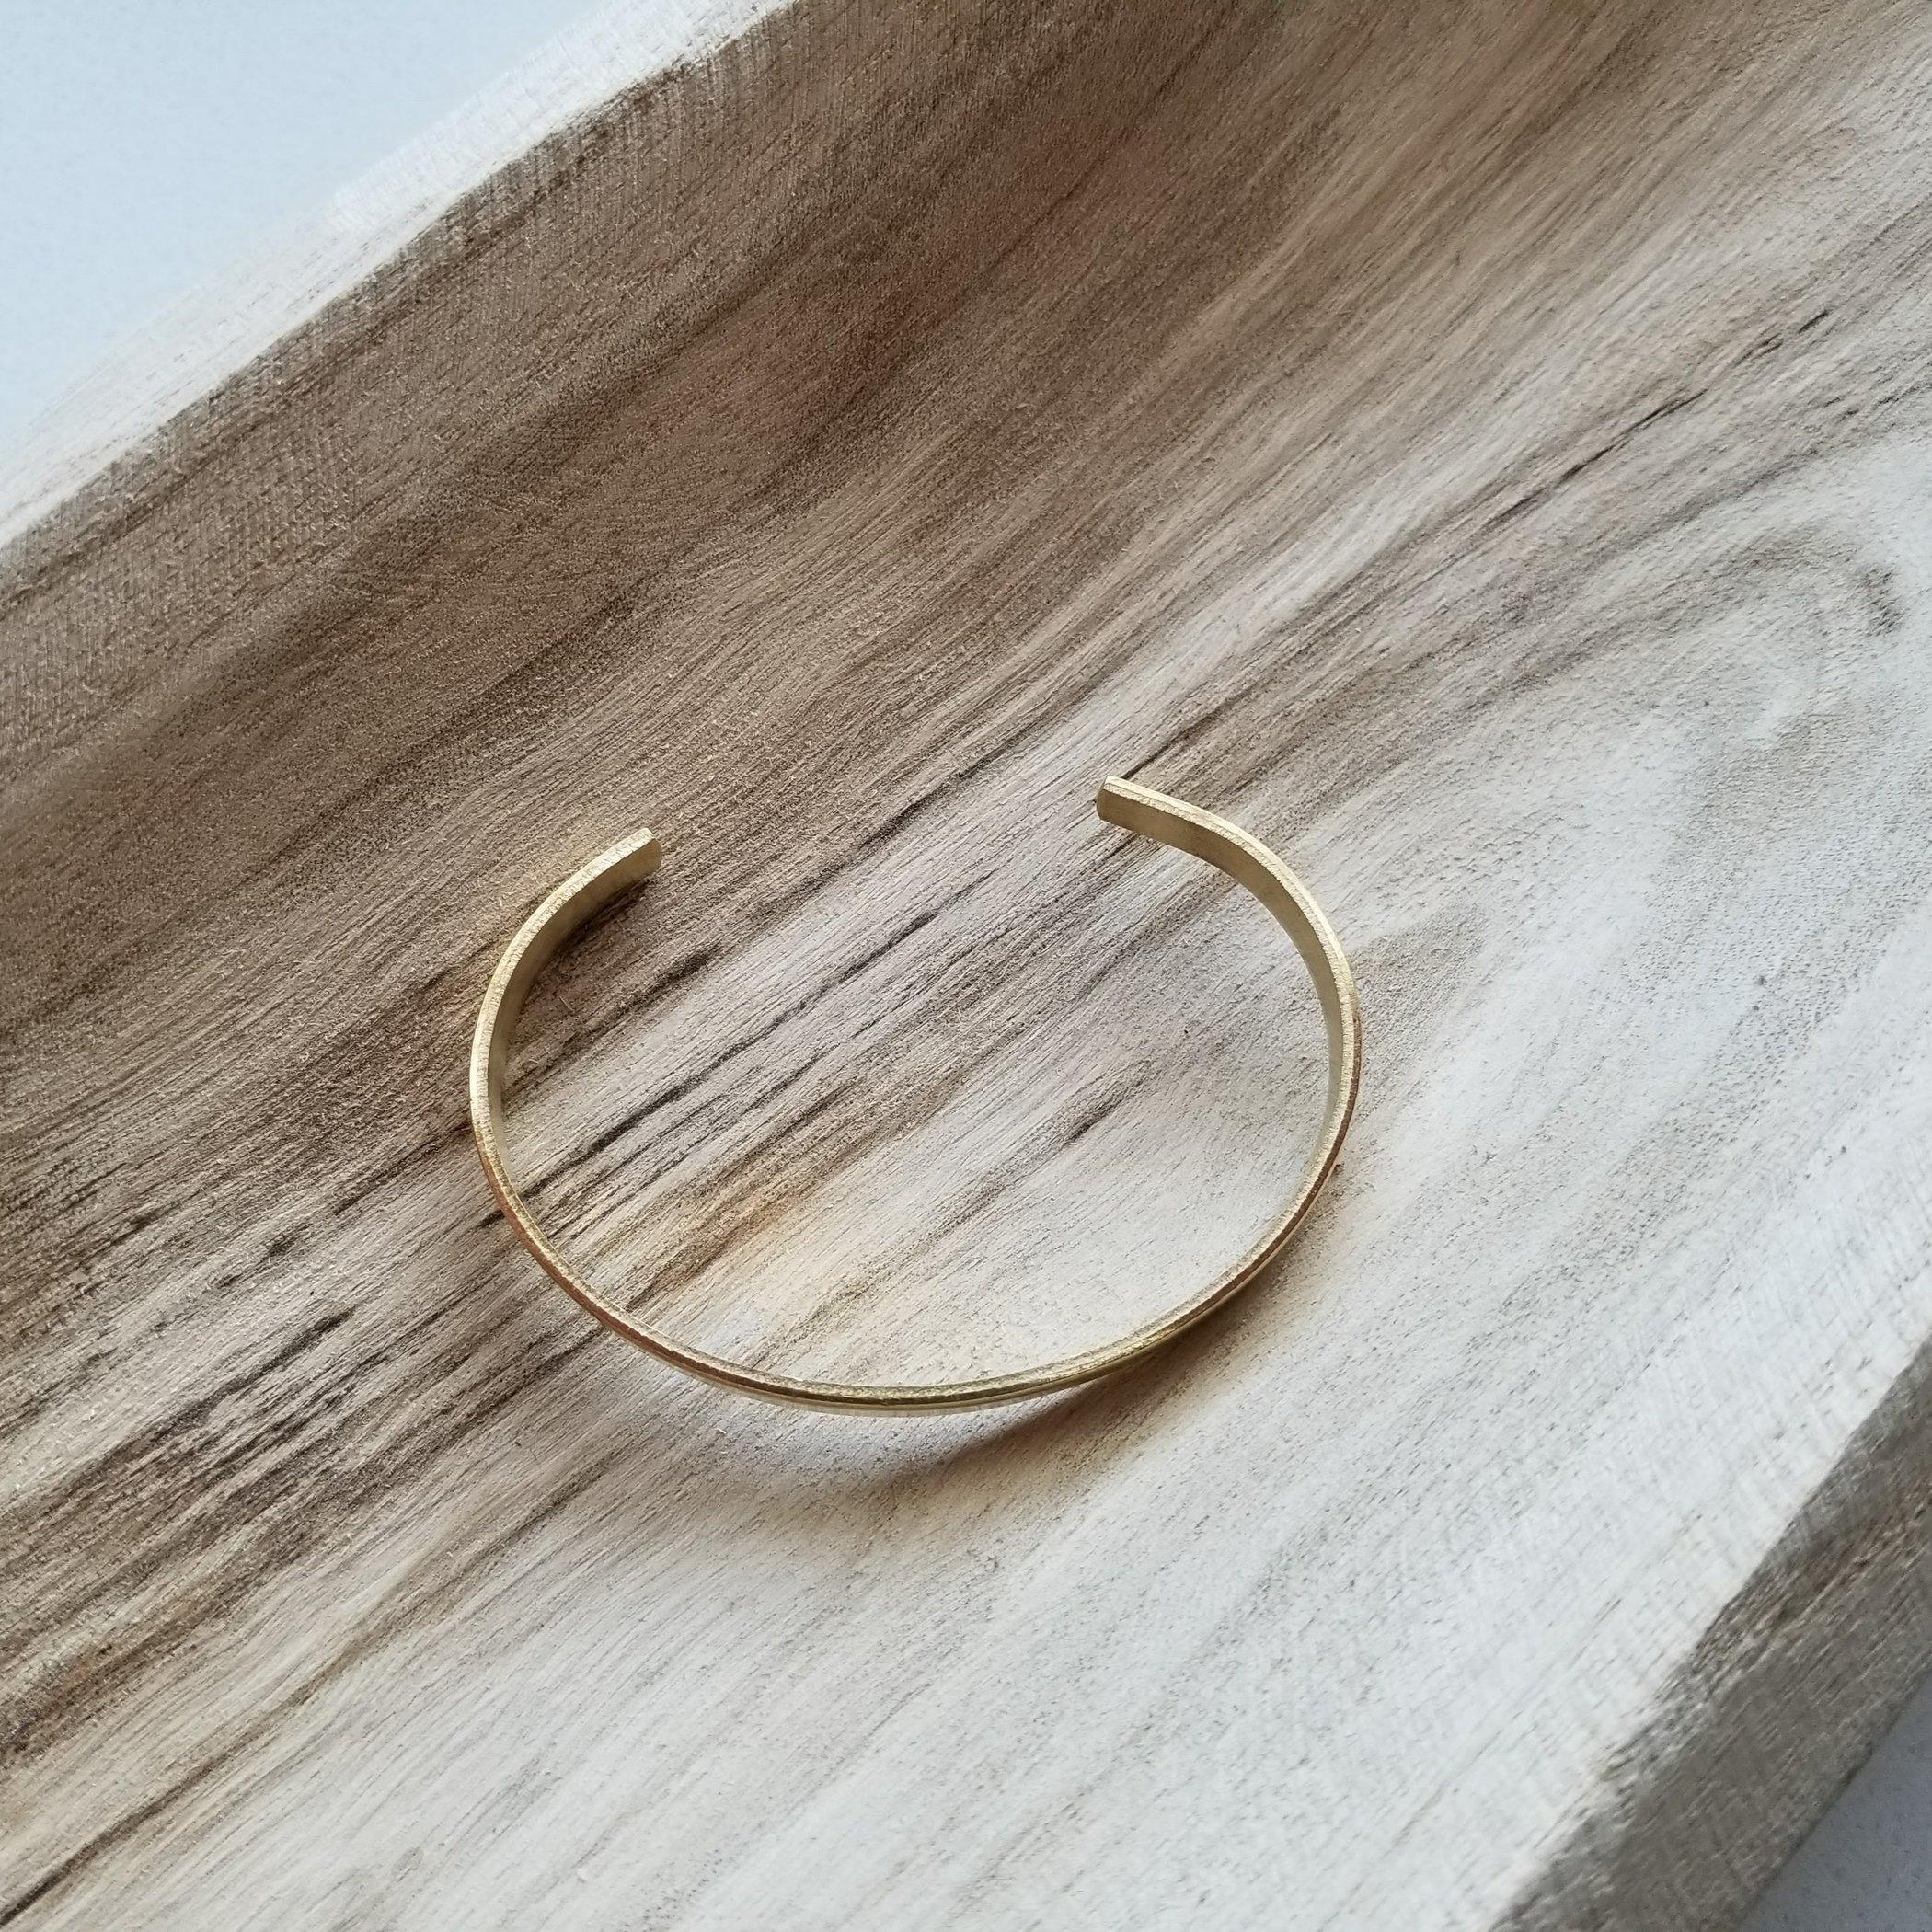 ABLE cuff | akindboutique.com #TheKindBrands | Fair Trade Bracelet